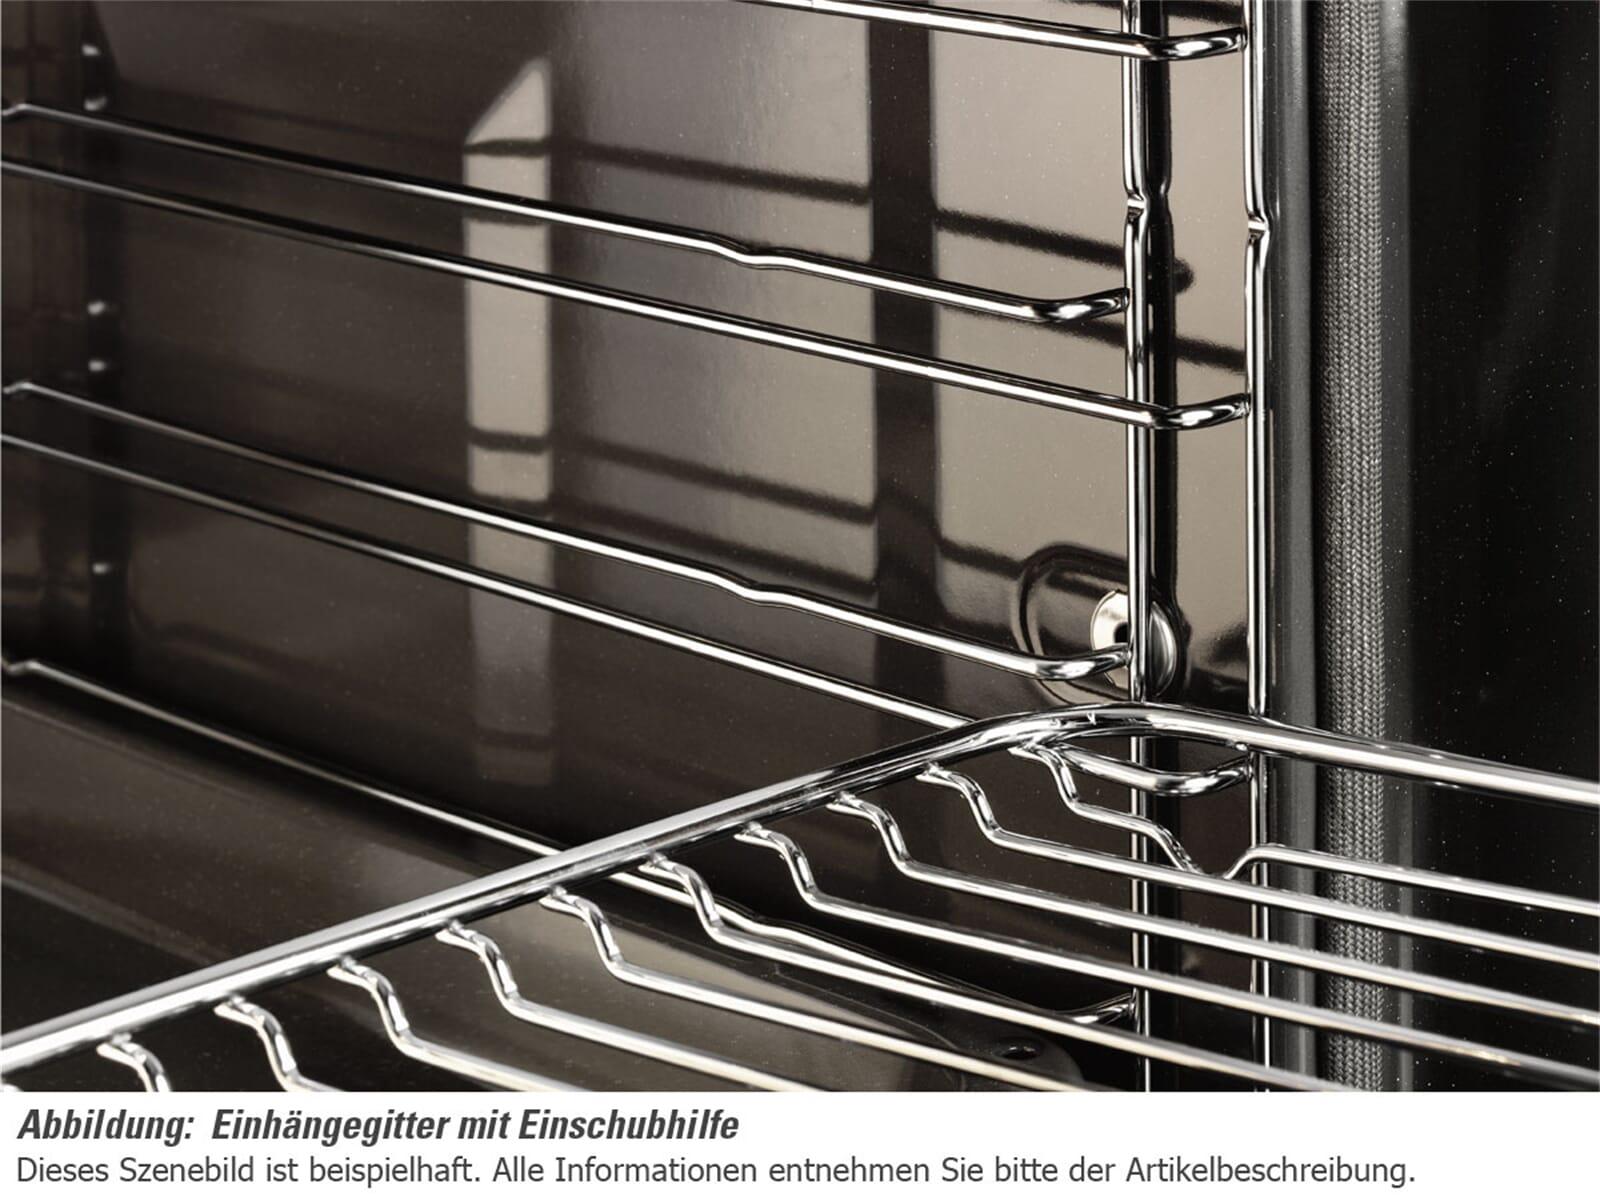 aeg electrolux eob3000bax backofen edelstahl einbaubackofen einbau herd ebay. Black Bedroom Furniture Sets. Home Design Ideas